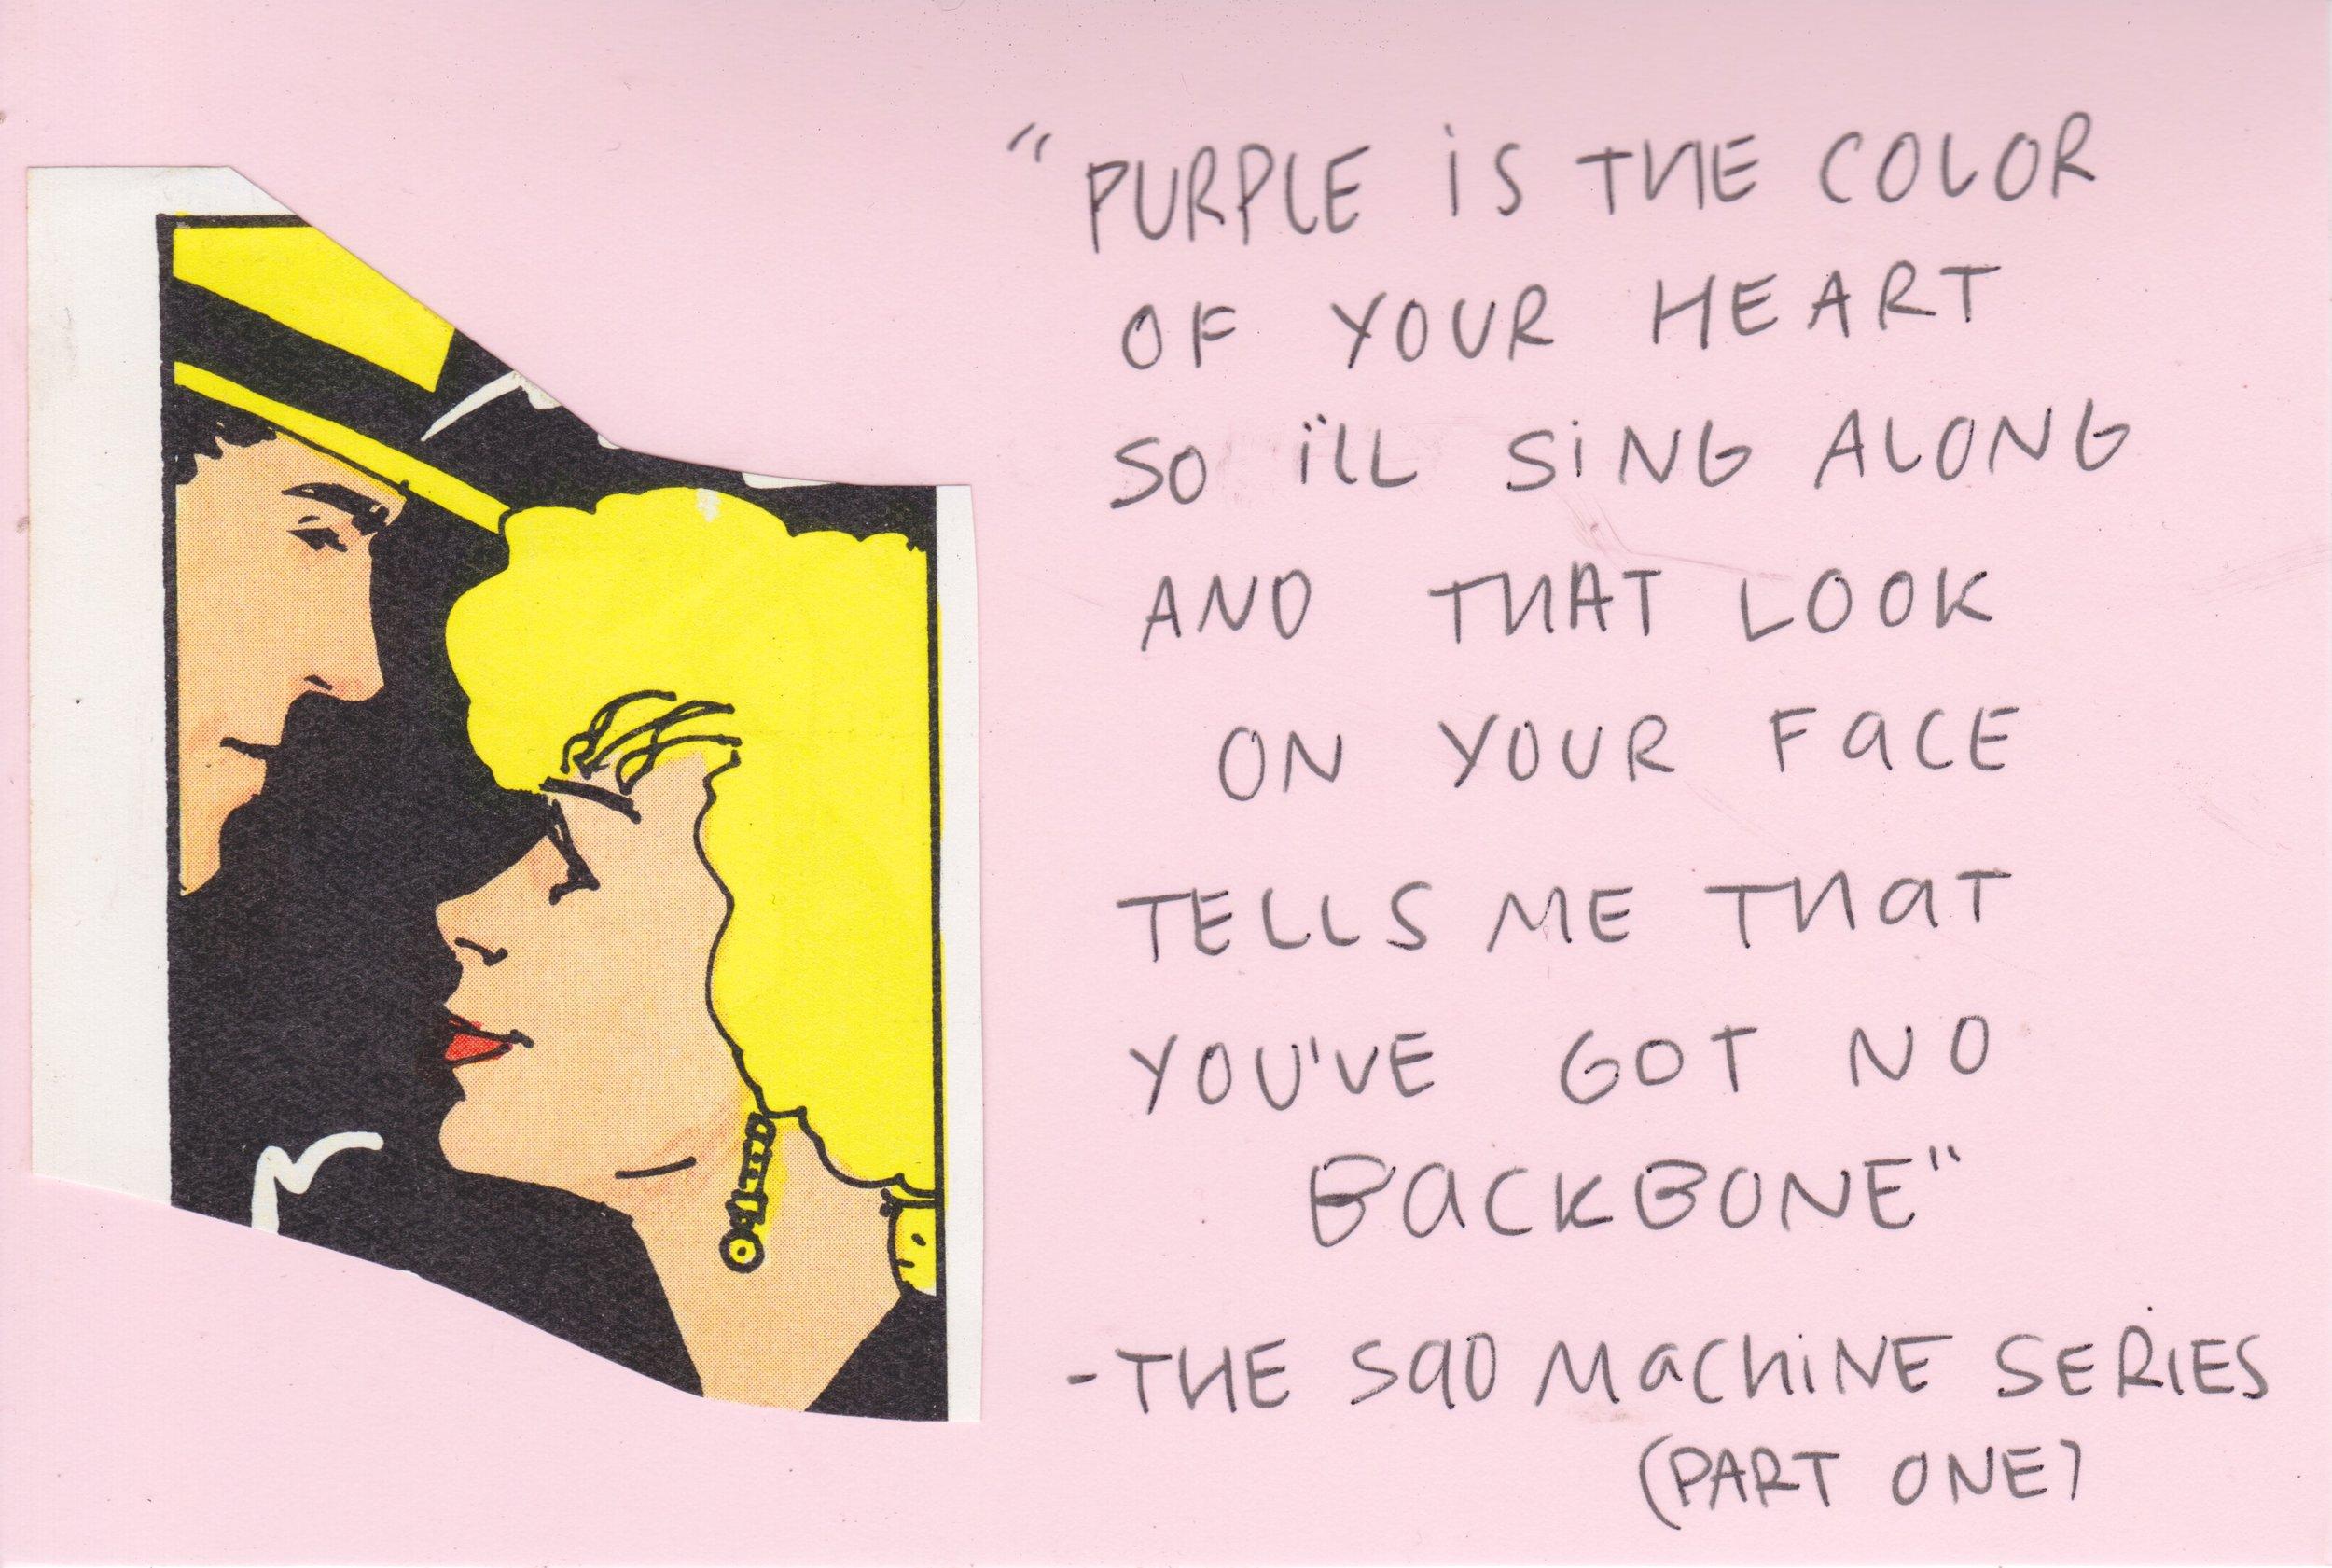 Sad Machine Series Quotes 5.jpeg